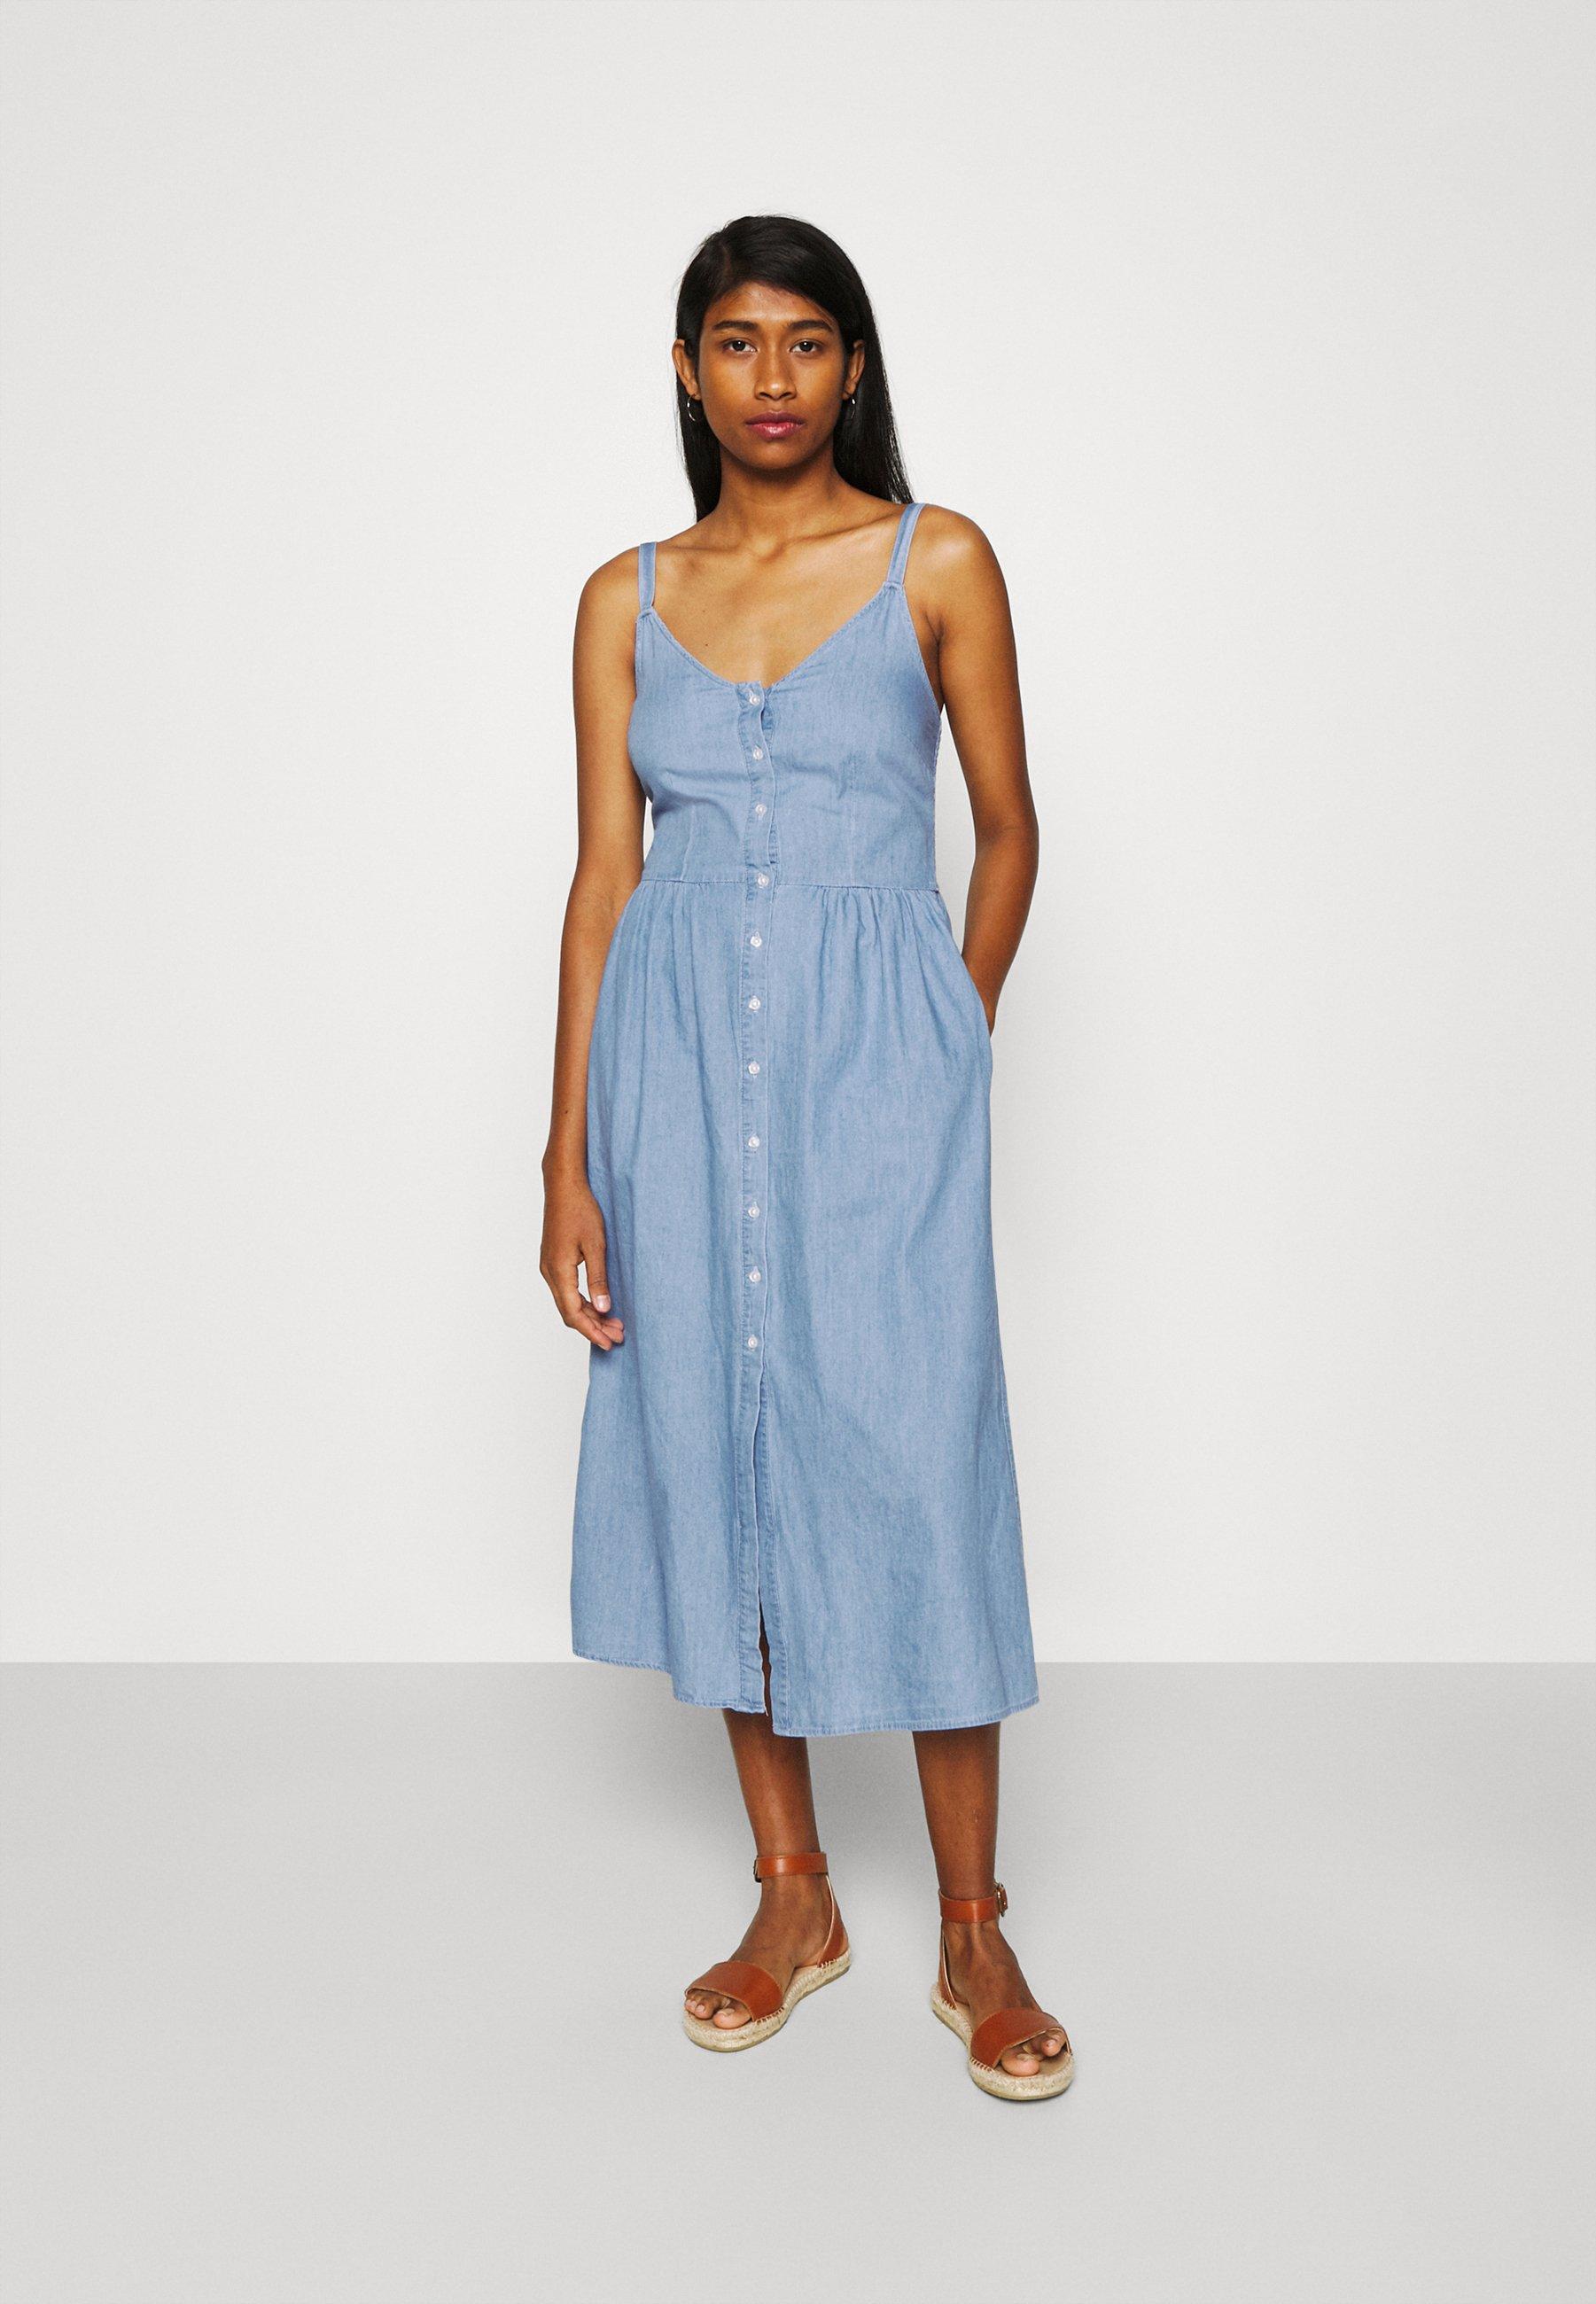 Light Blue Strap Dress,blue jean dress,blue jean dress,